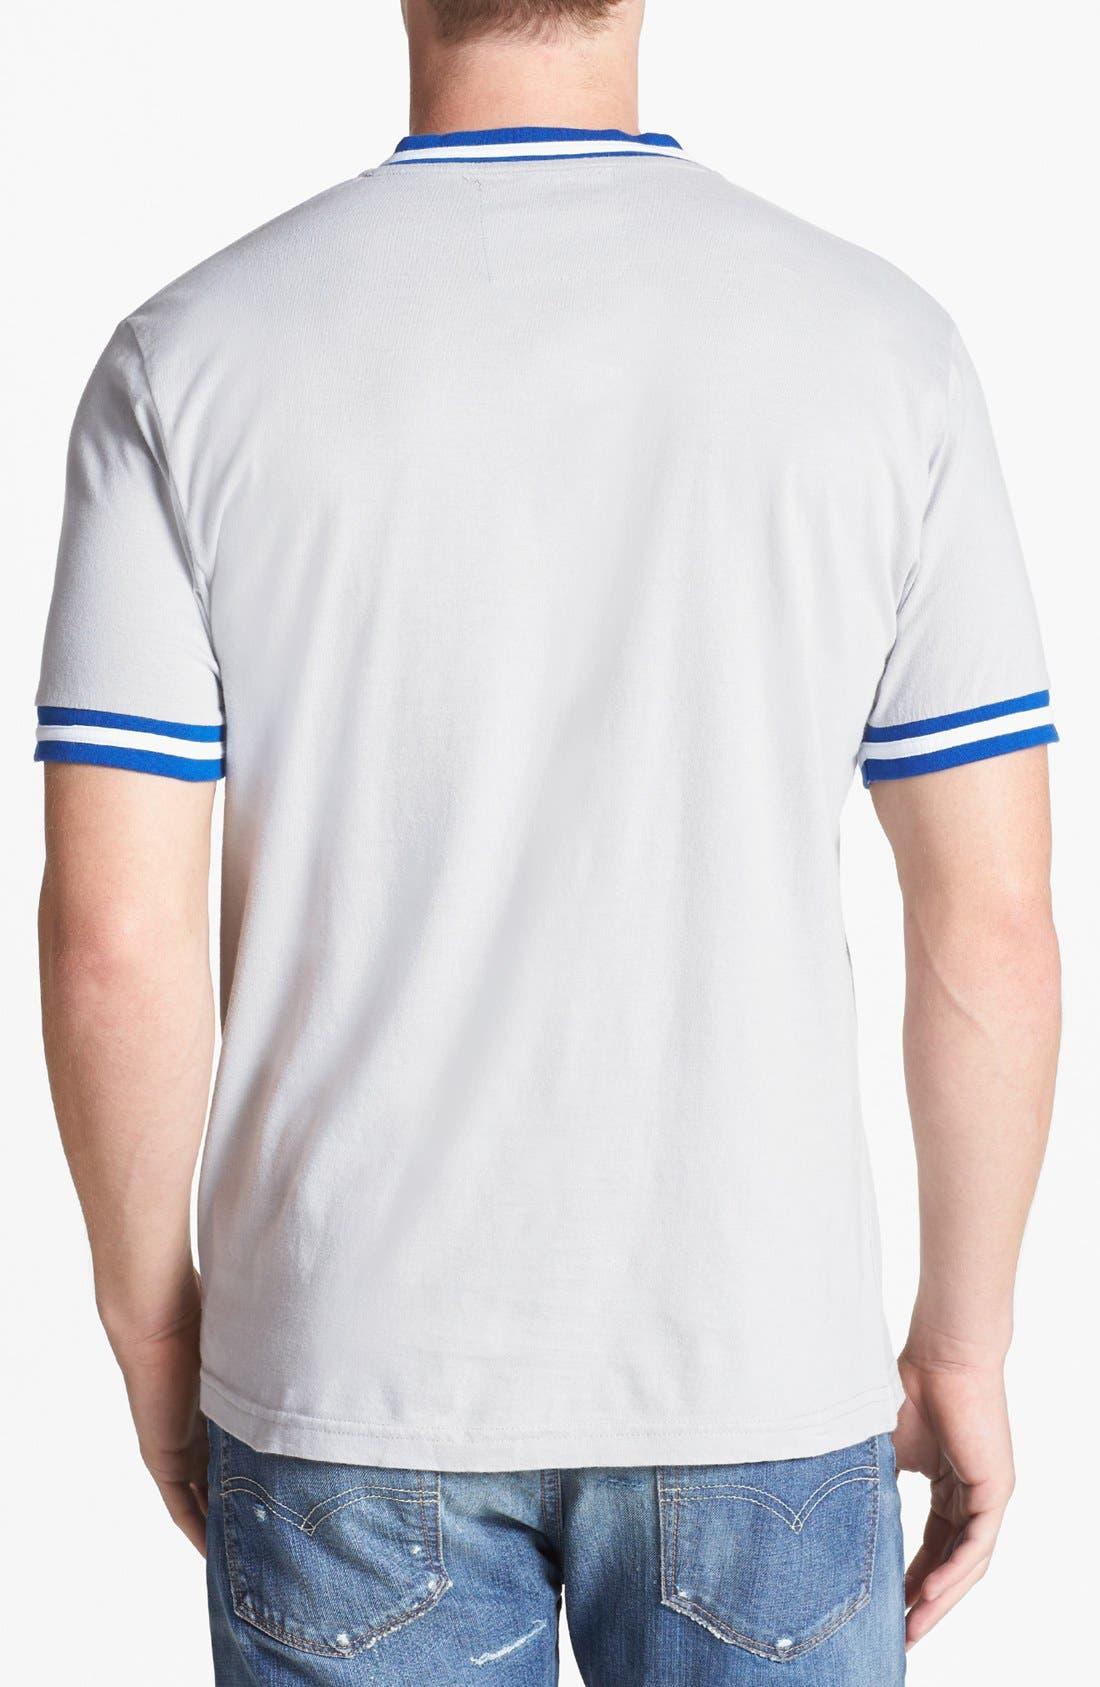 Alternate Image 2  - Wright & Ditson 'Los Angeles Dodgers' V-Neck T-Shirt